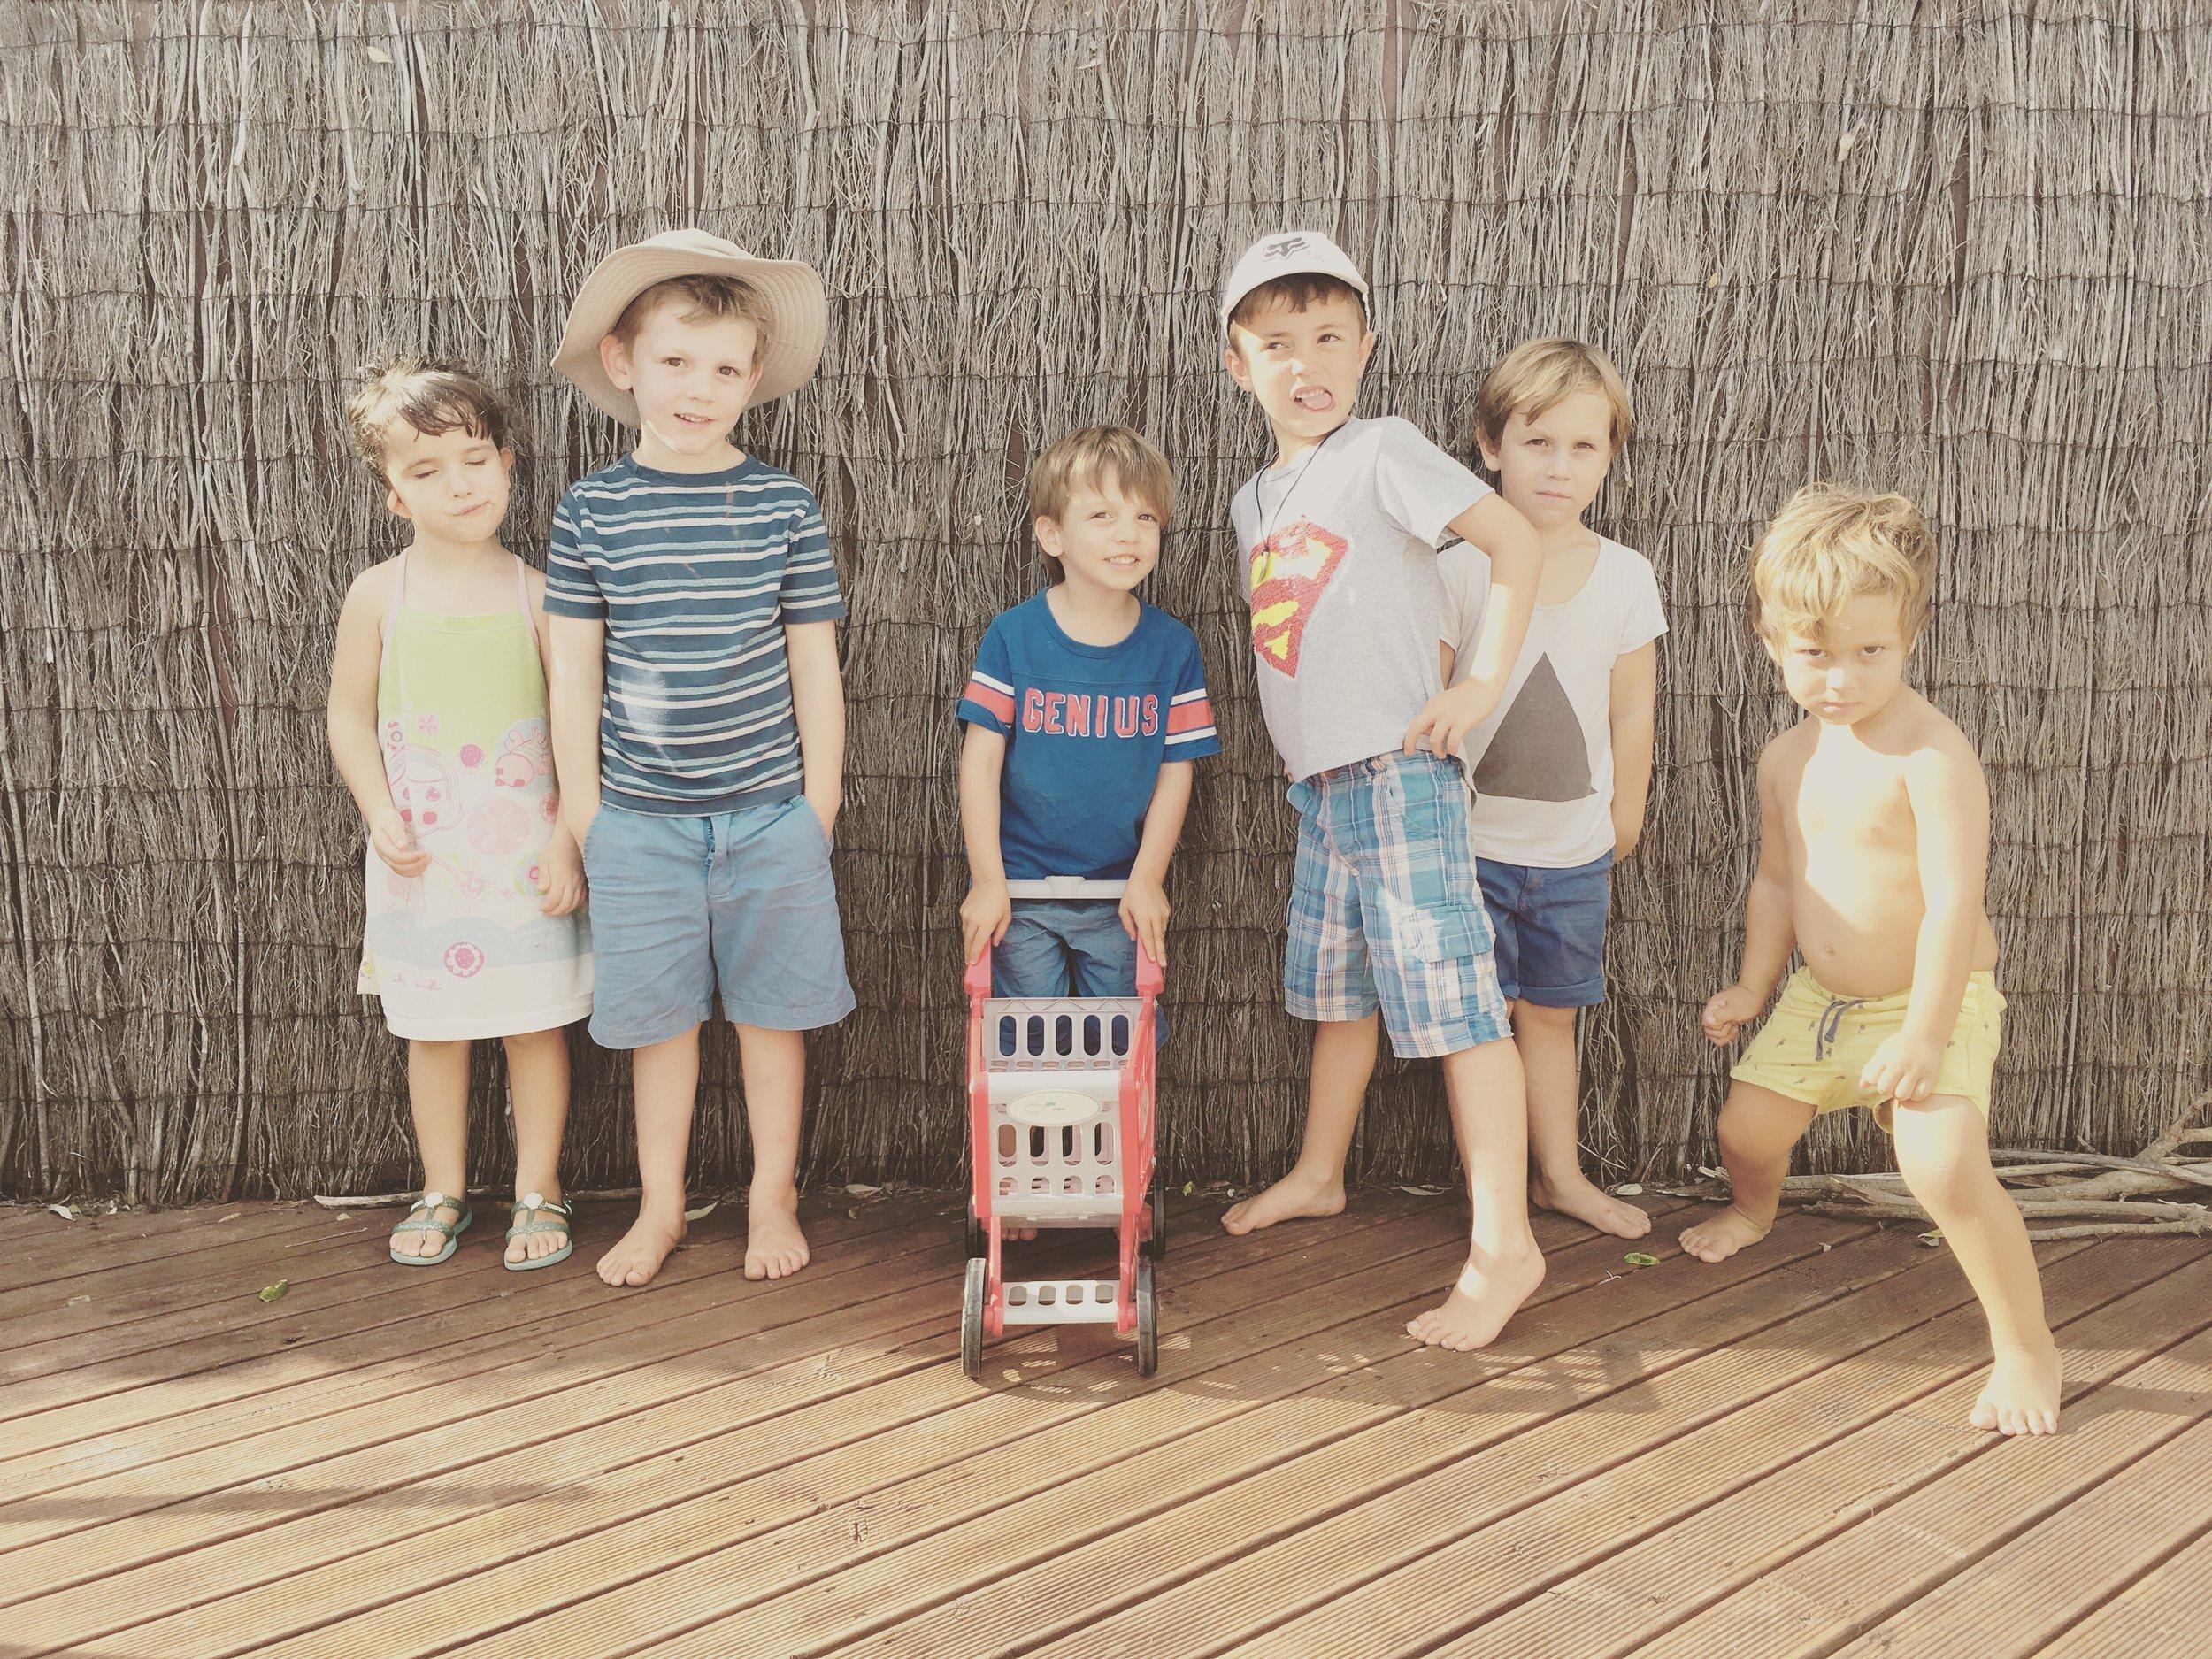 Ela, Lucca, Marco, Pablo, Beni and Blas.